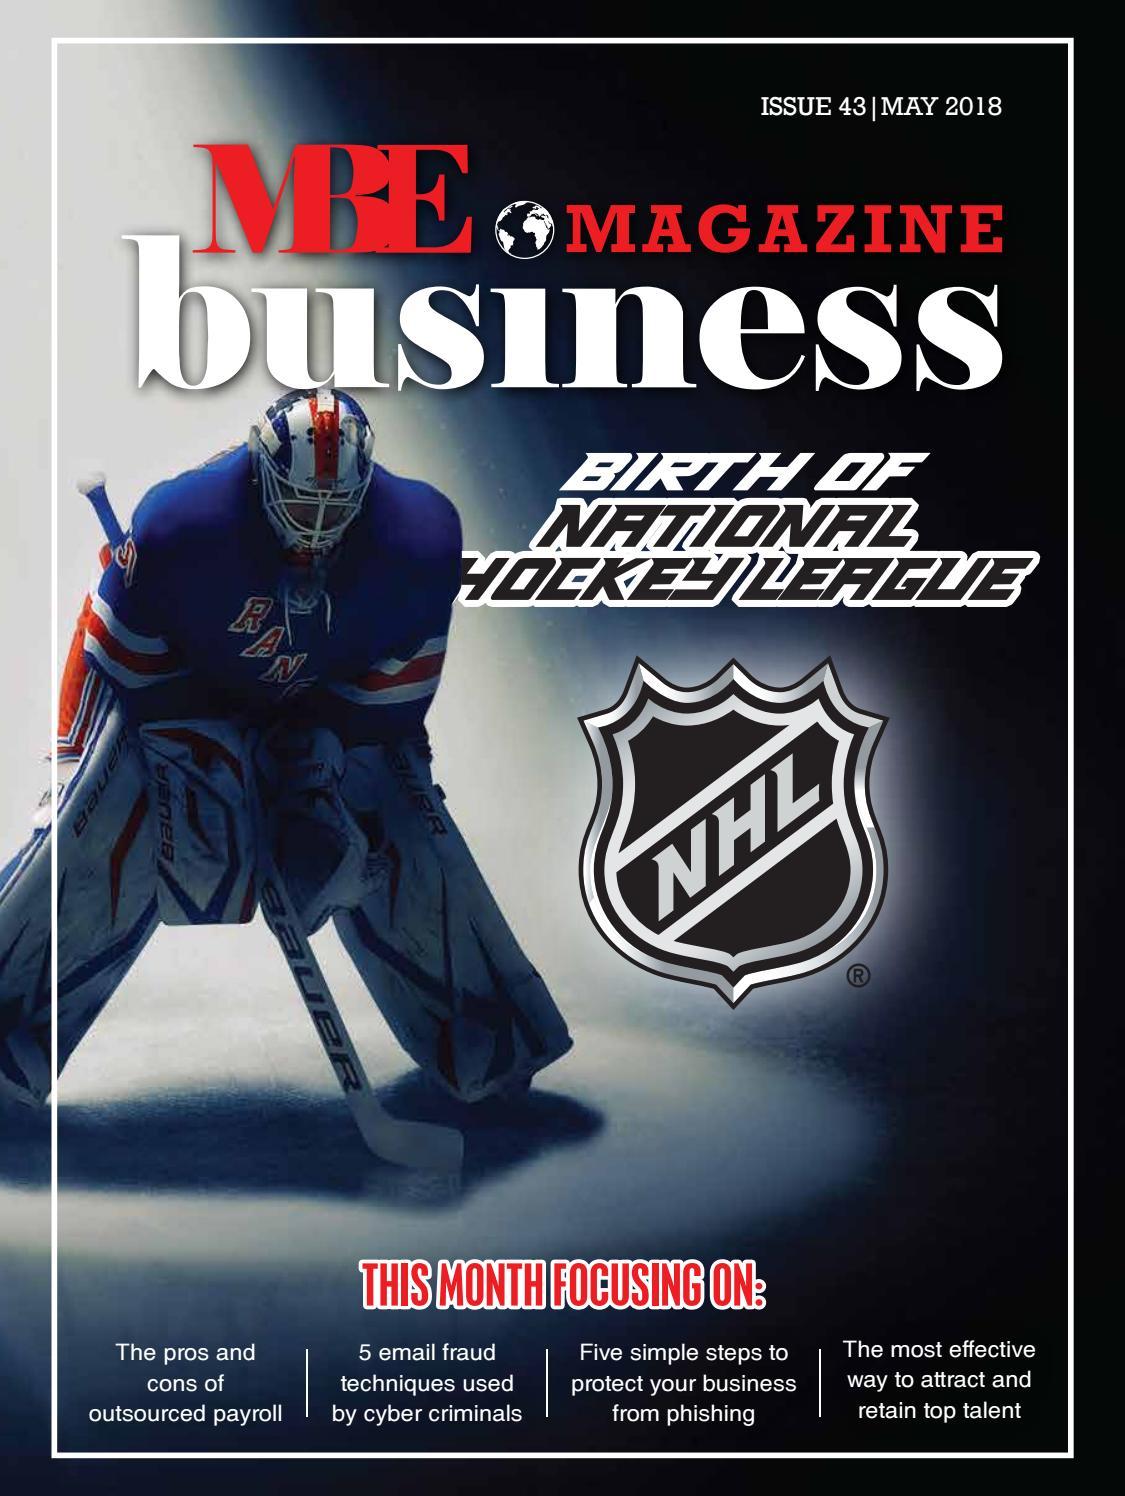 Avis Cuisine Hacker 2018 mbe business magazinembe business magazine - issuu